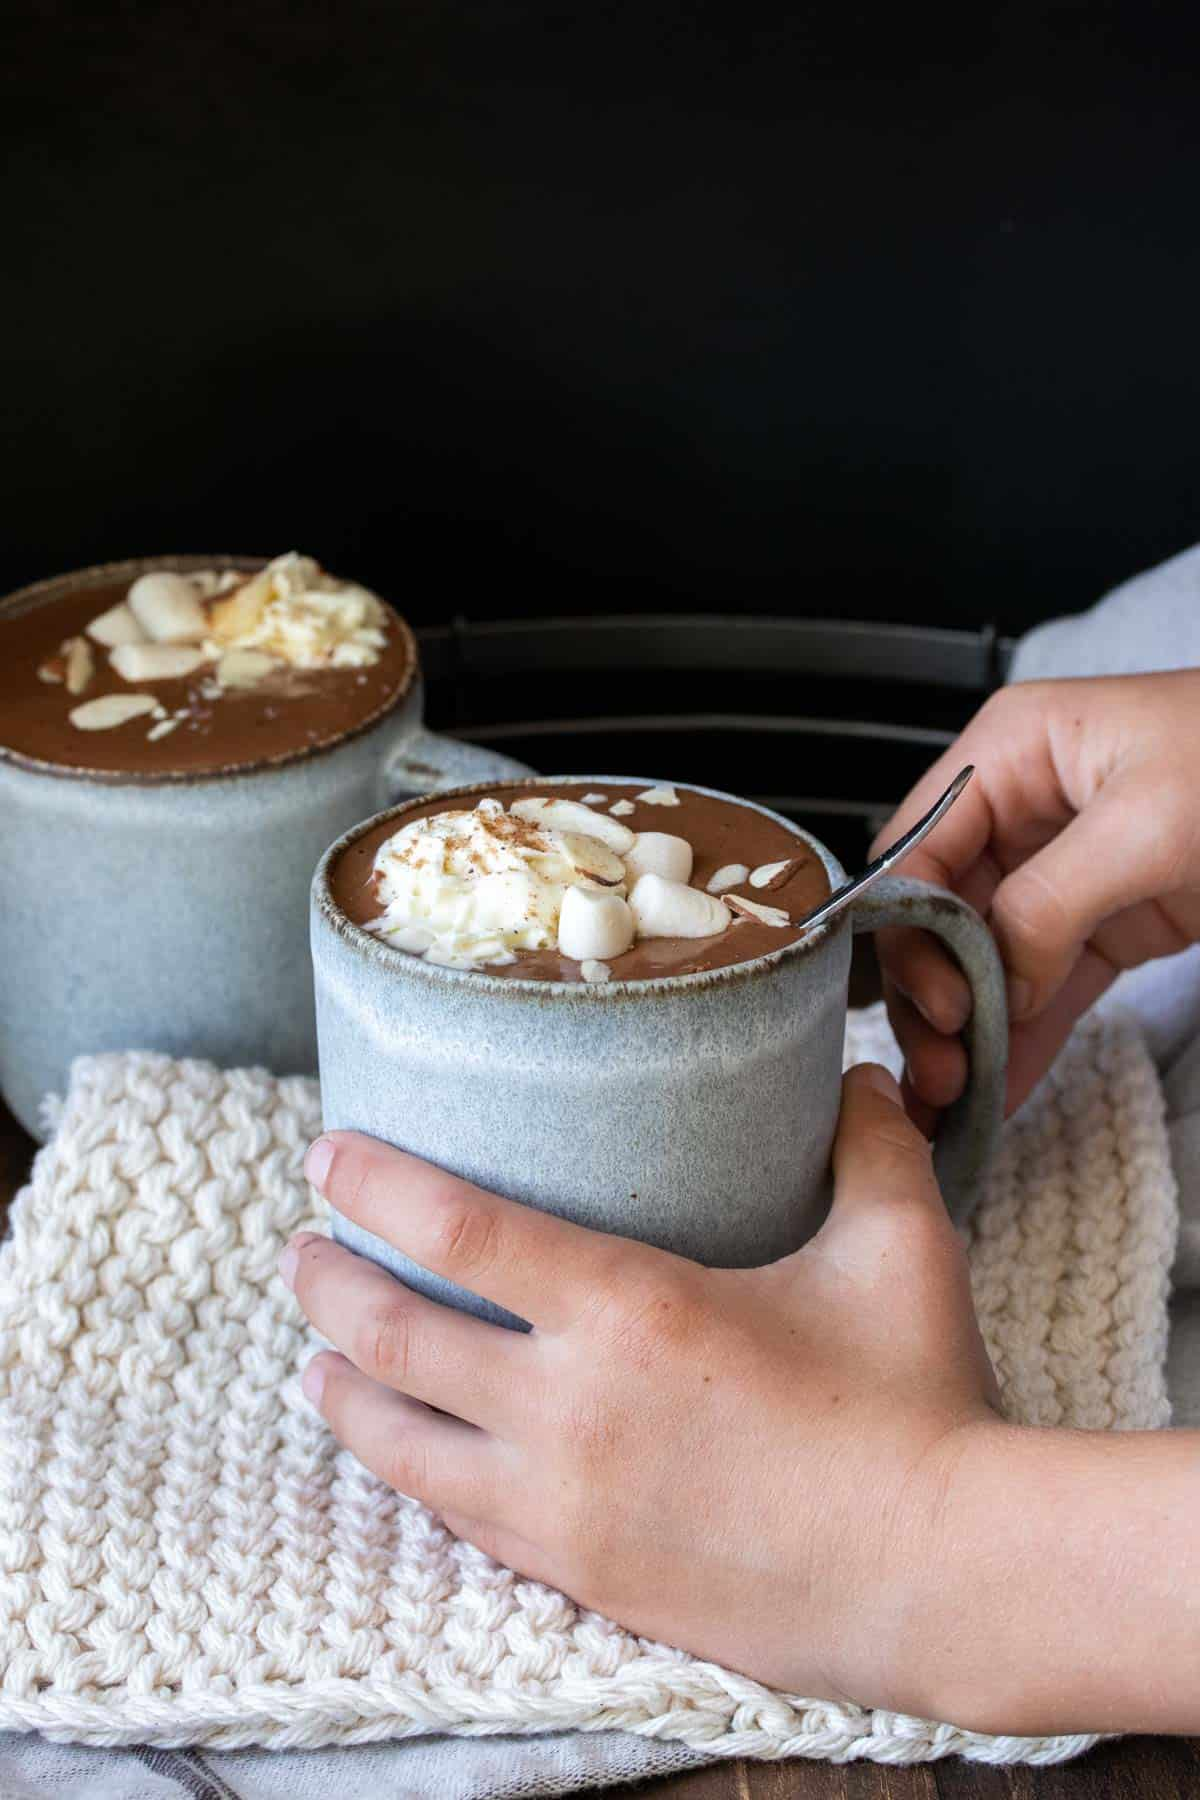 Hands grabbing a grey mug filled with hot cocoa